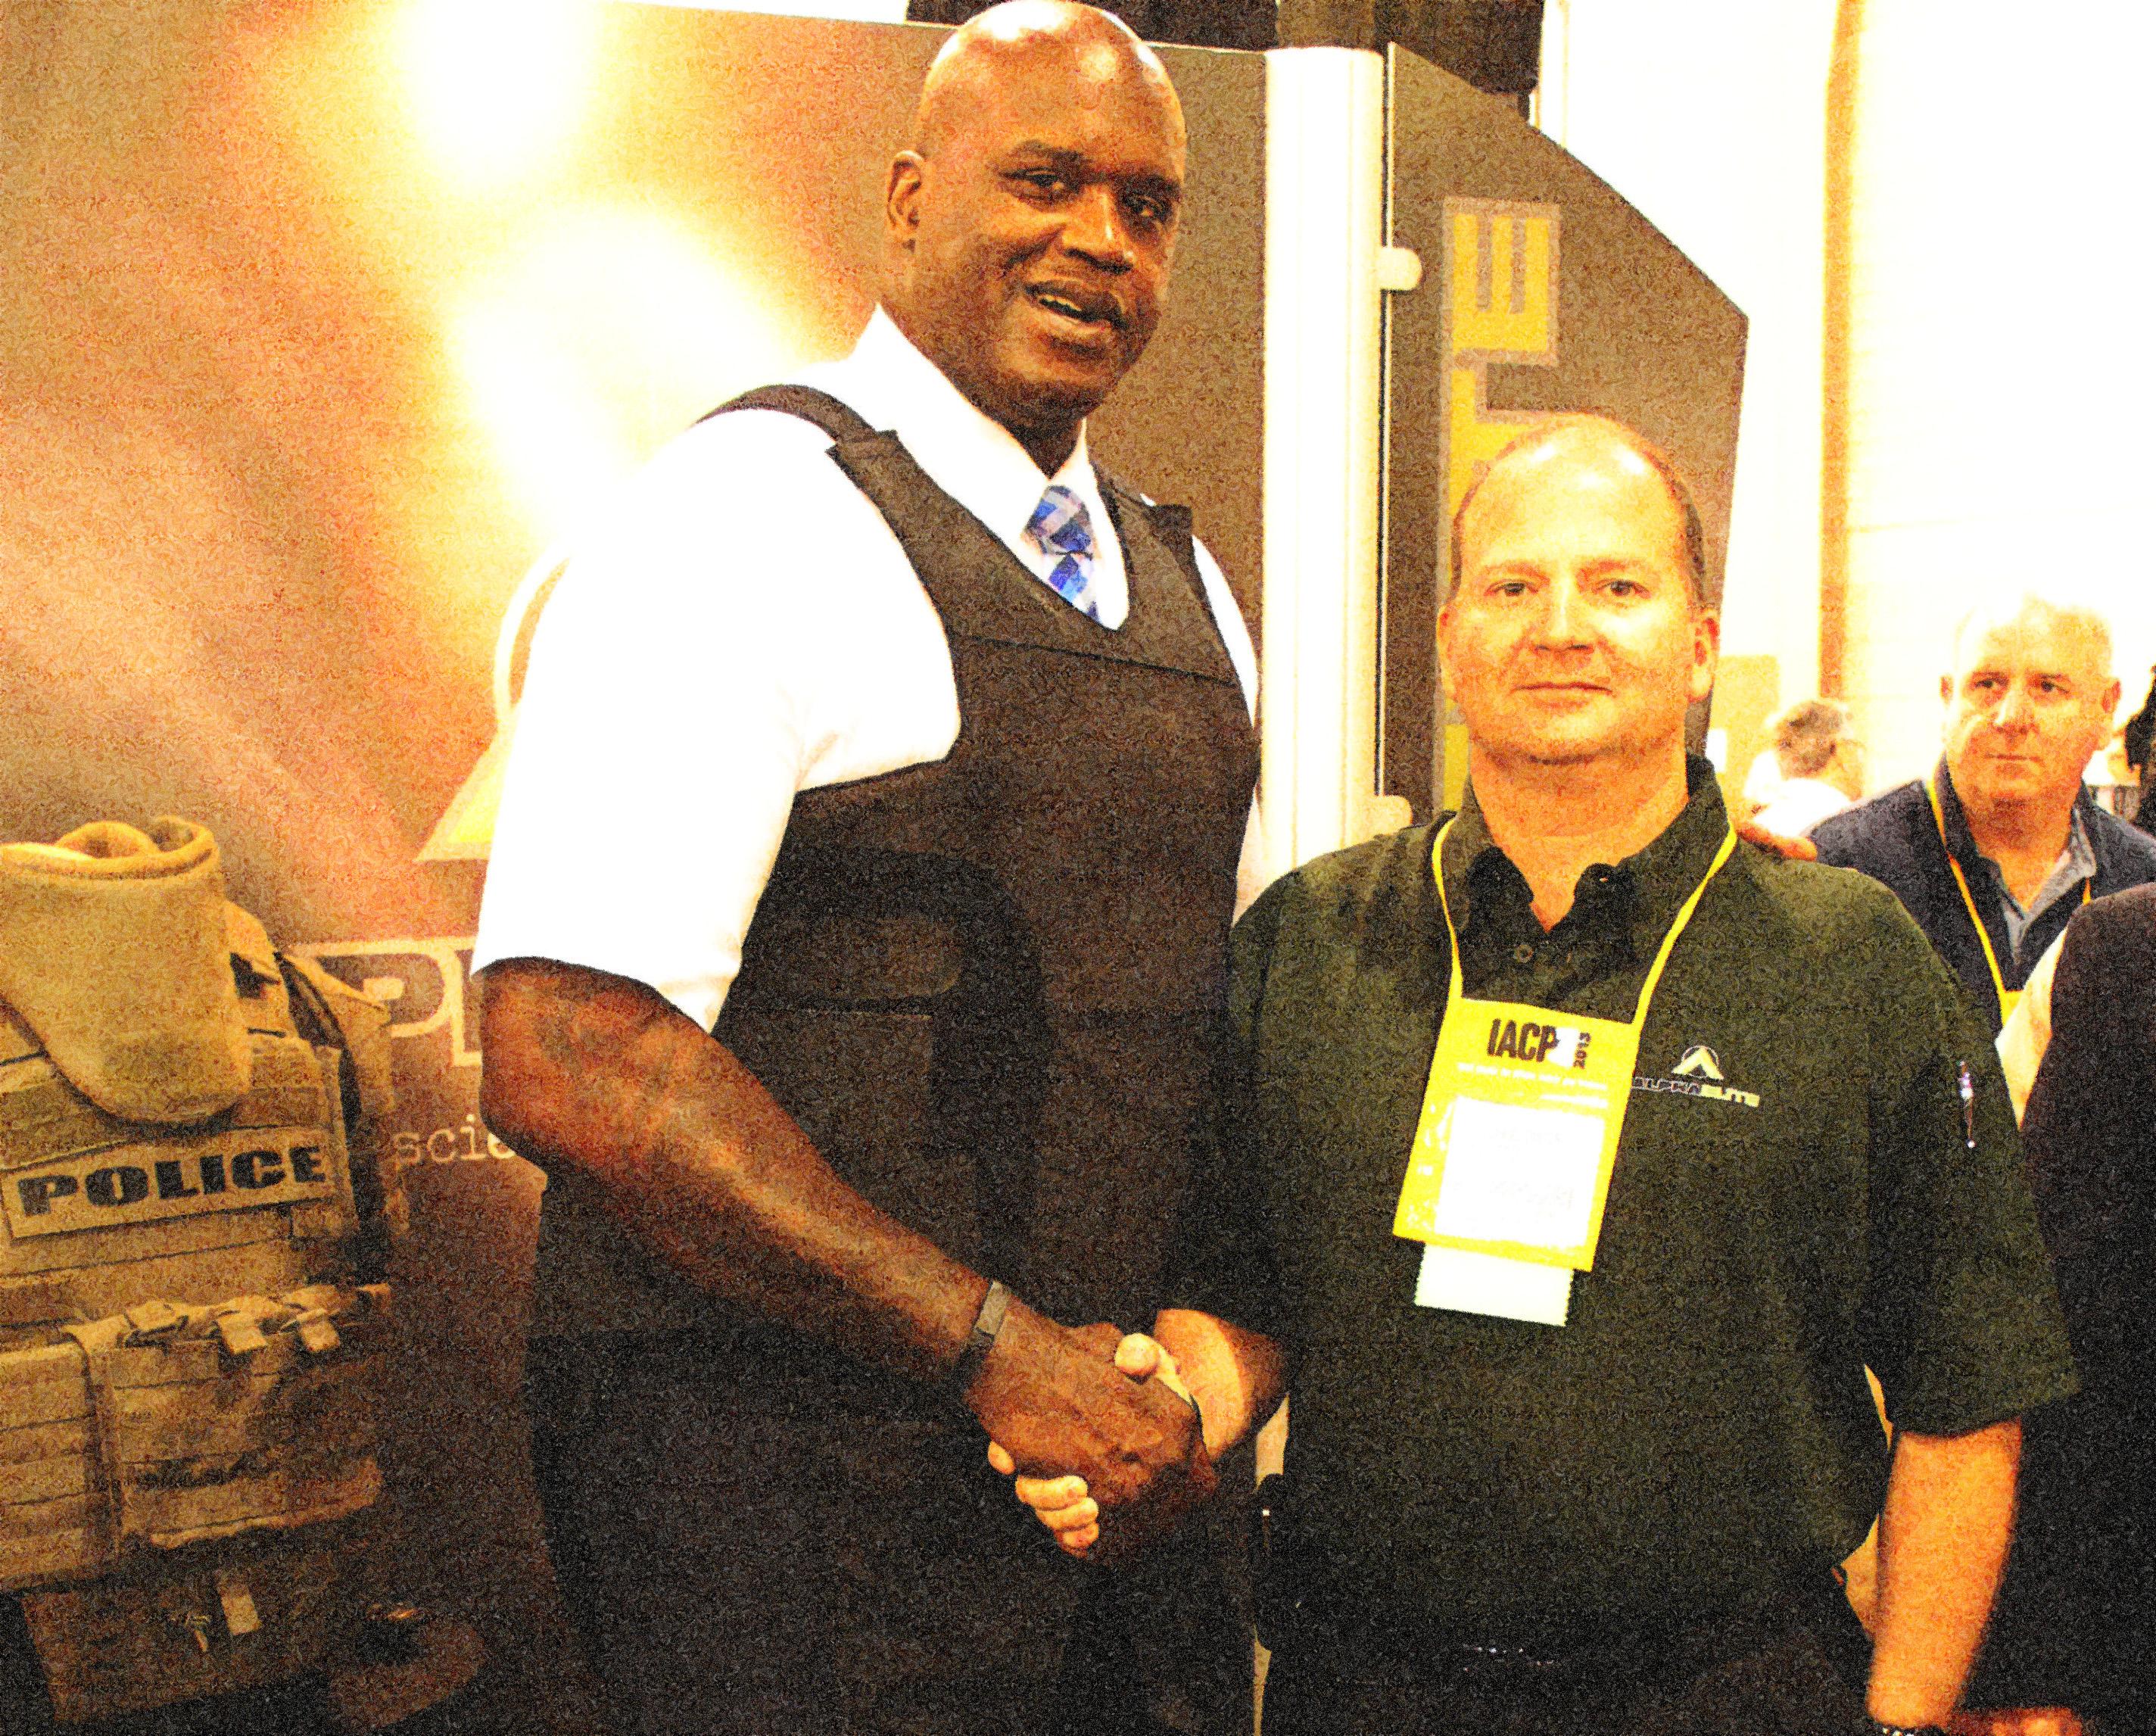 IACP 2013 - Shaq in his Point Blank Alpha Elite with CEO Daniel Gaston